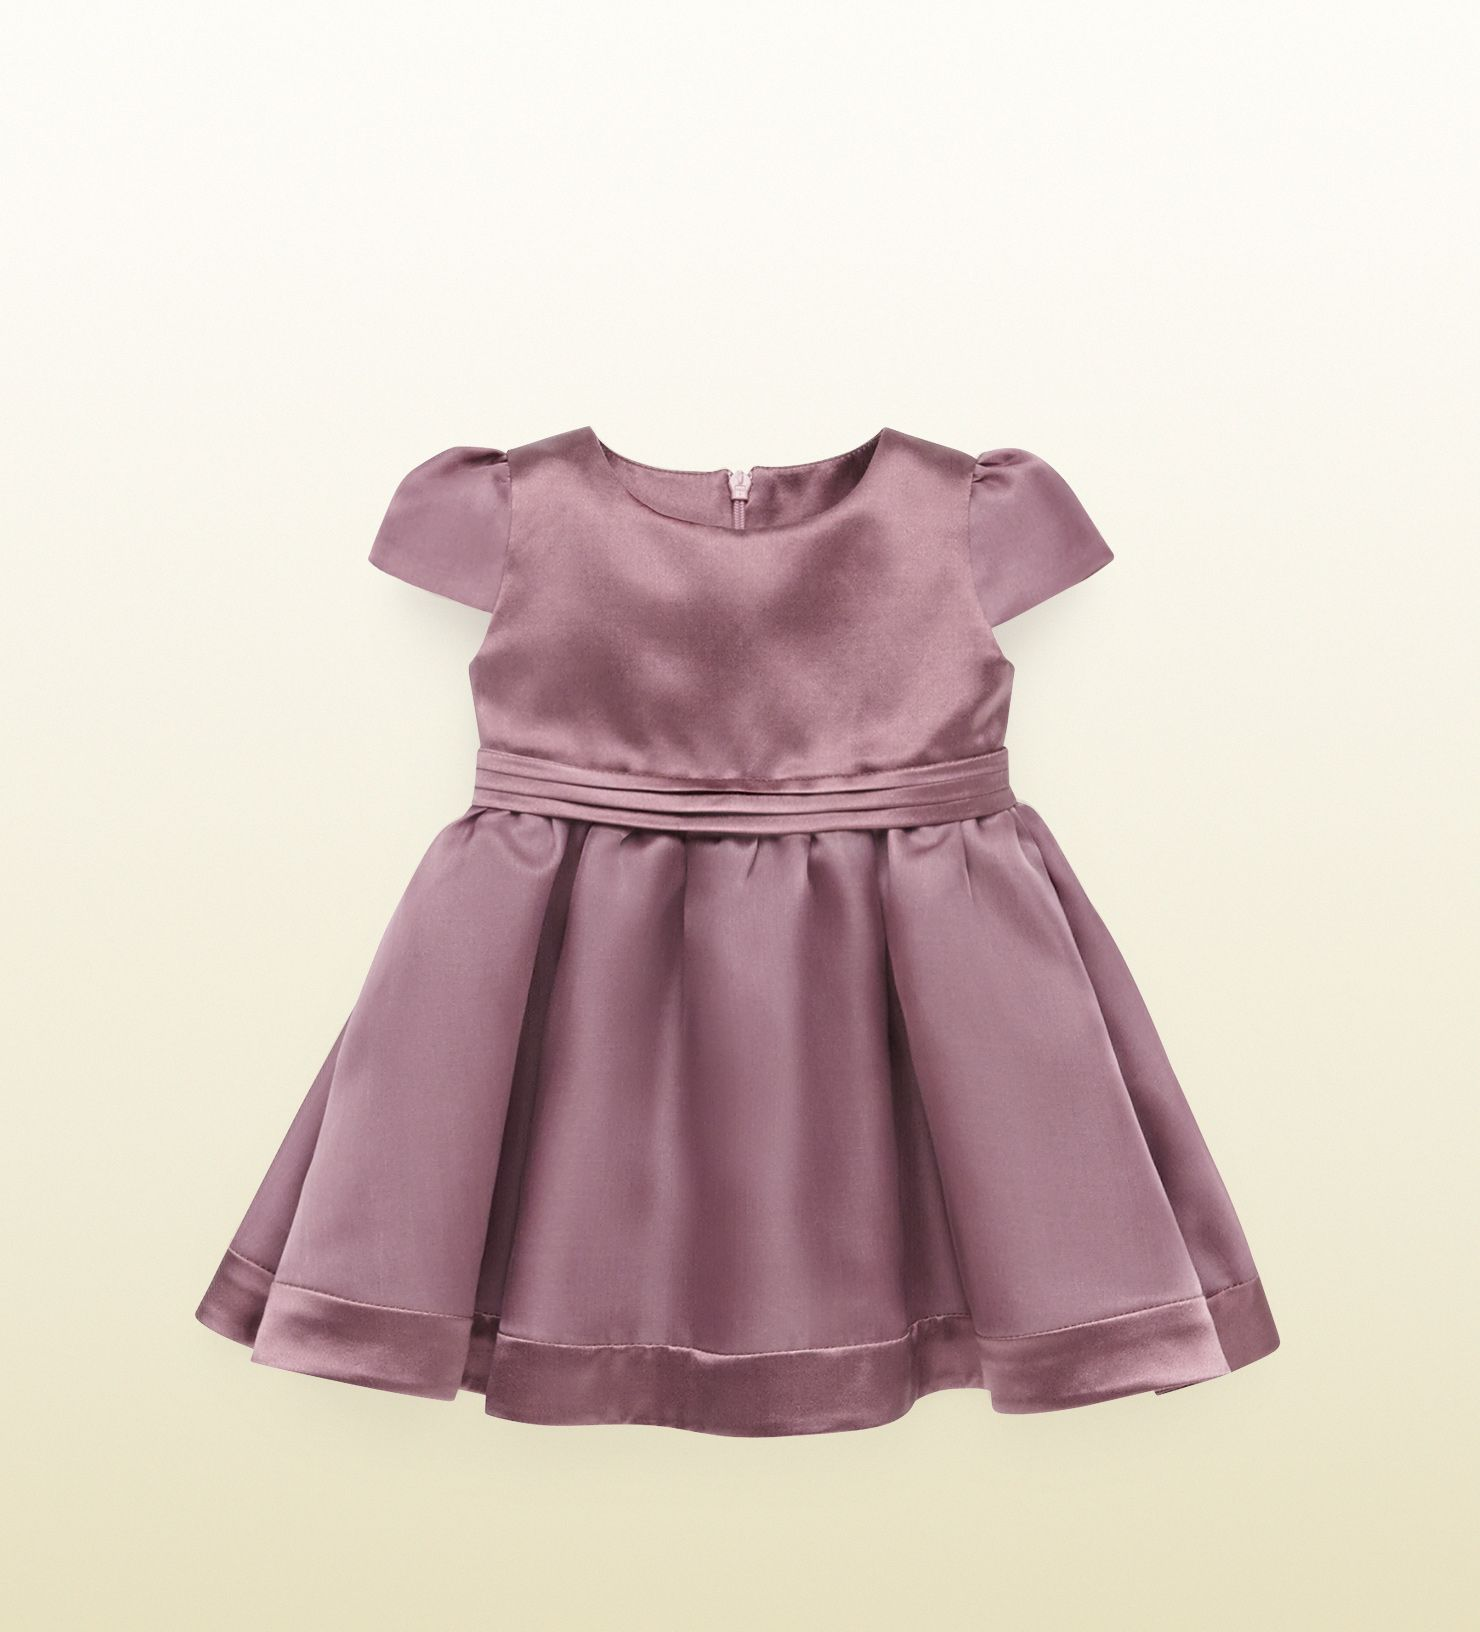 Gucci Kids AW14 silk organza and satin dress baby girl